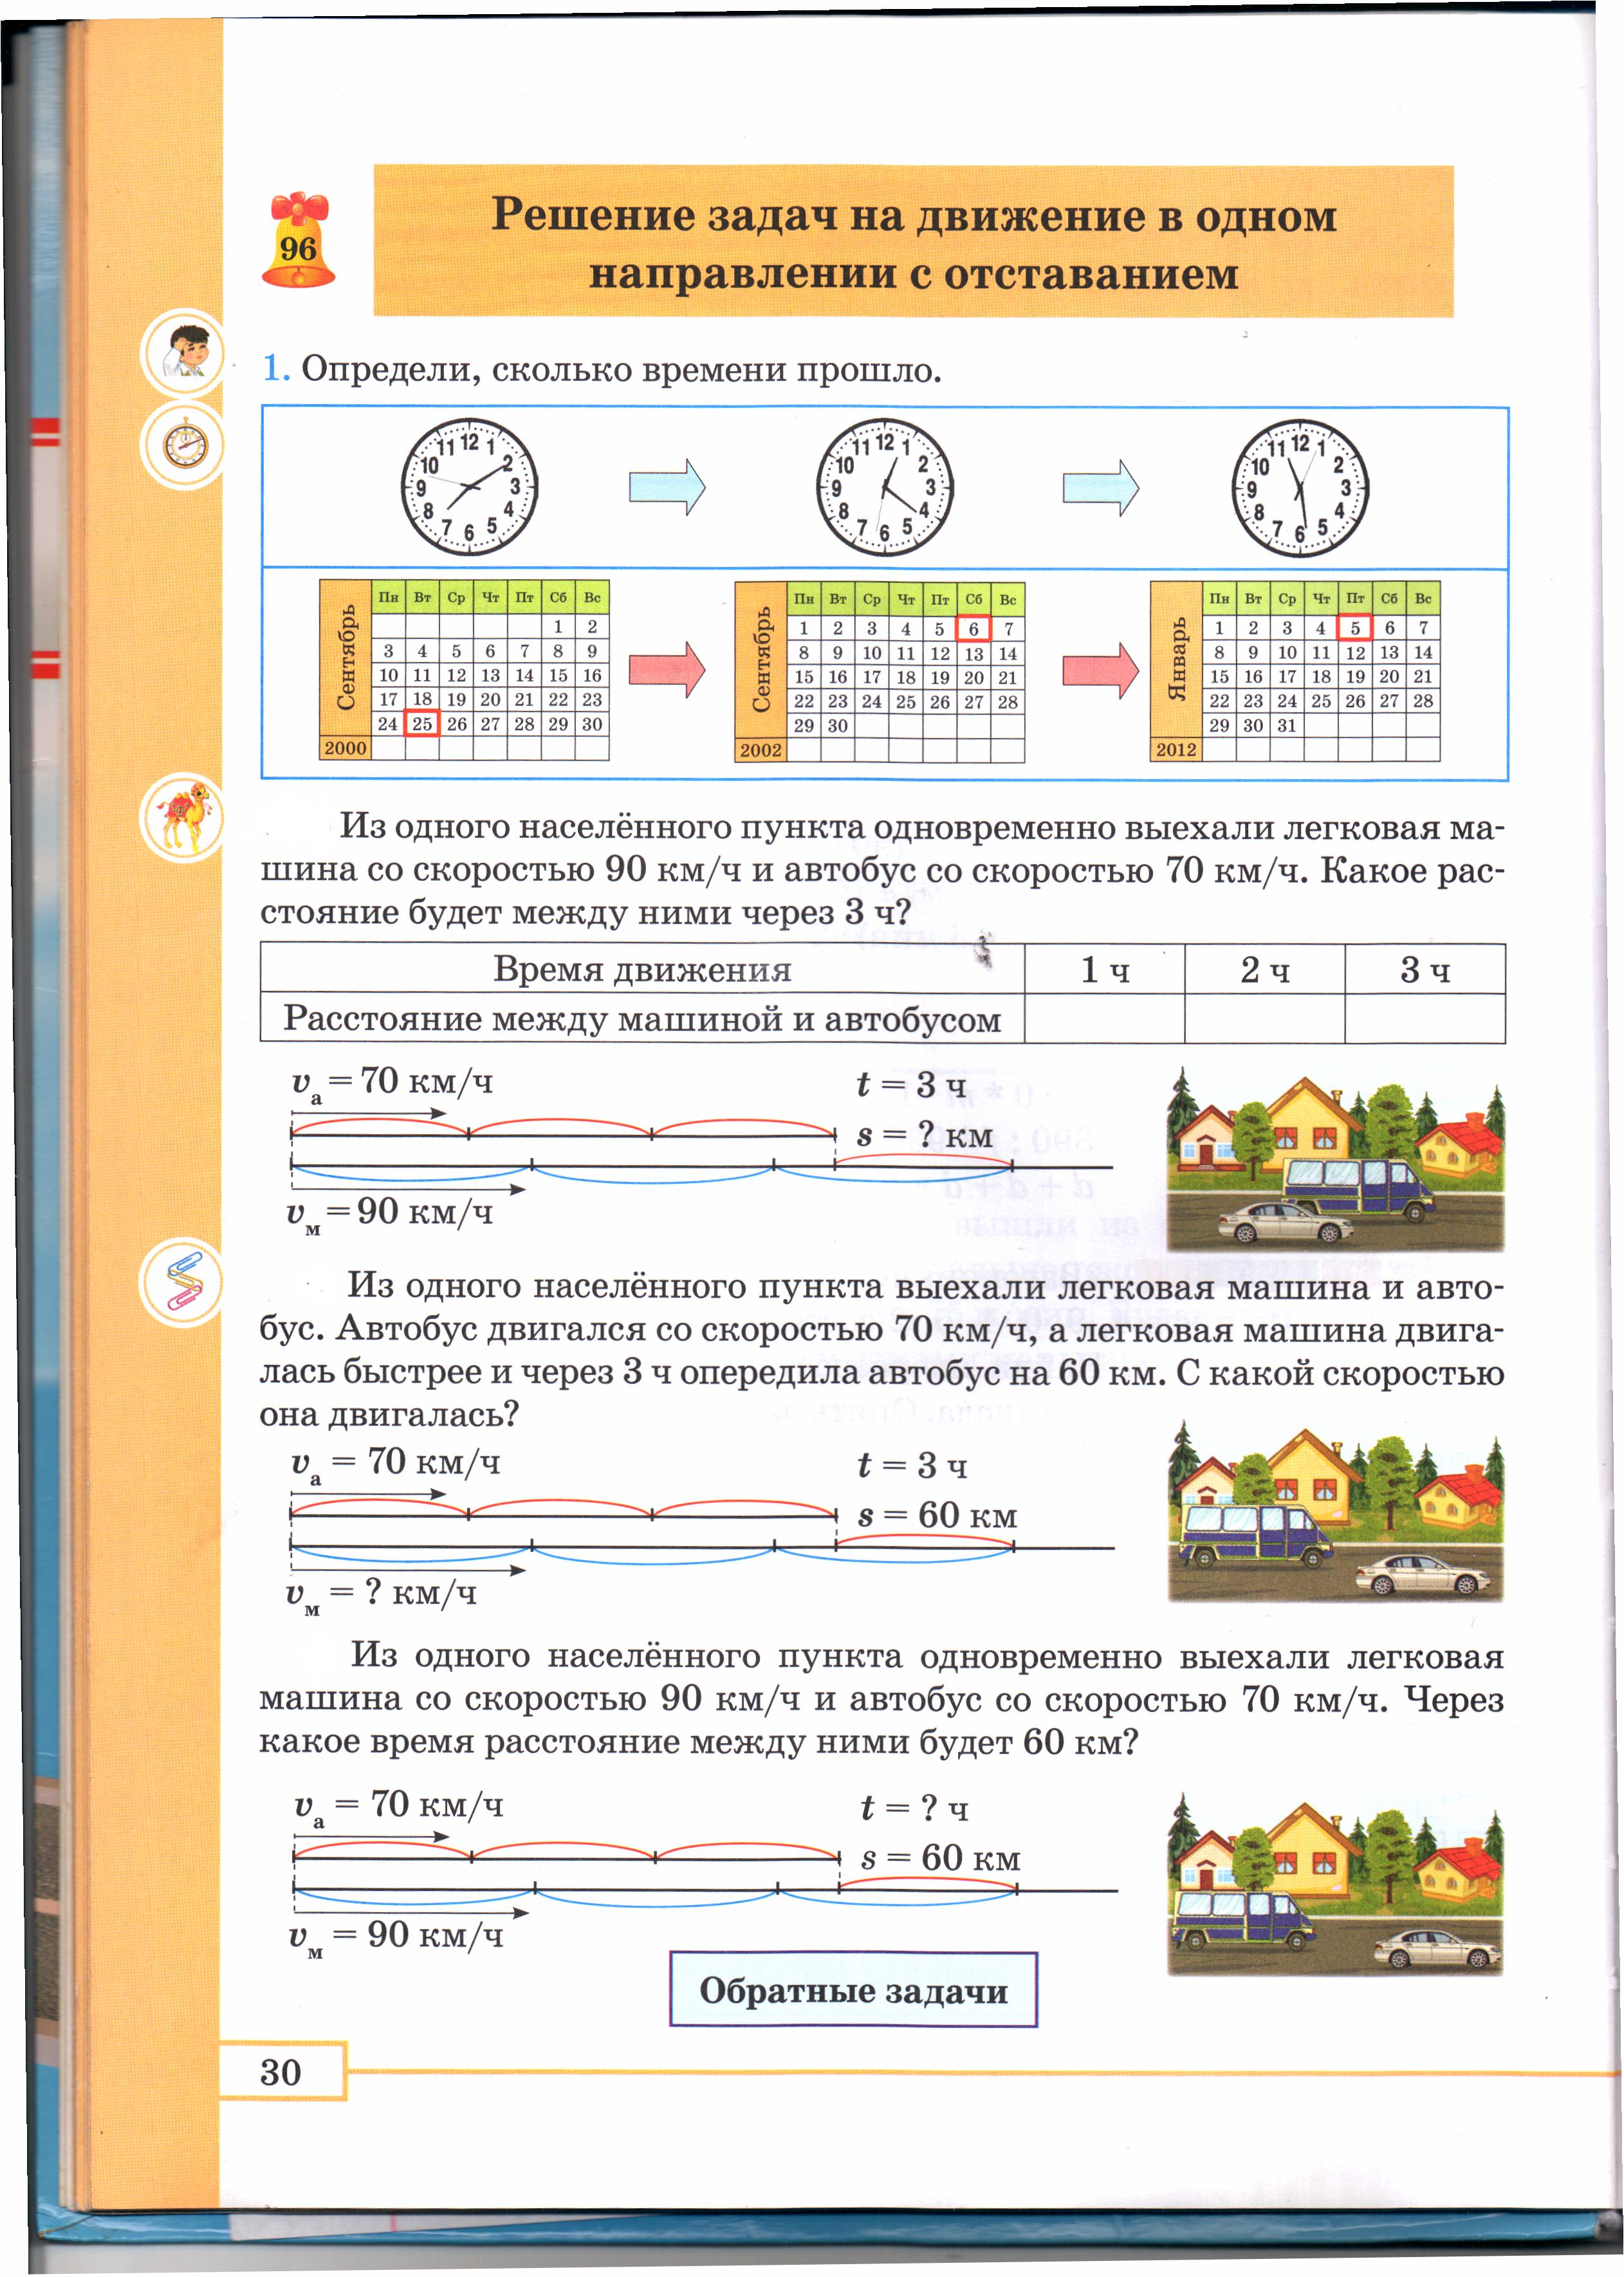 Тема решение задач на движение 5 класс решение онлайн задач исследование операций